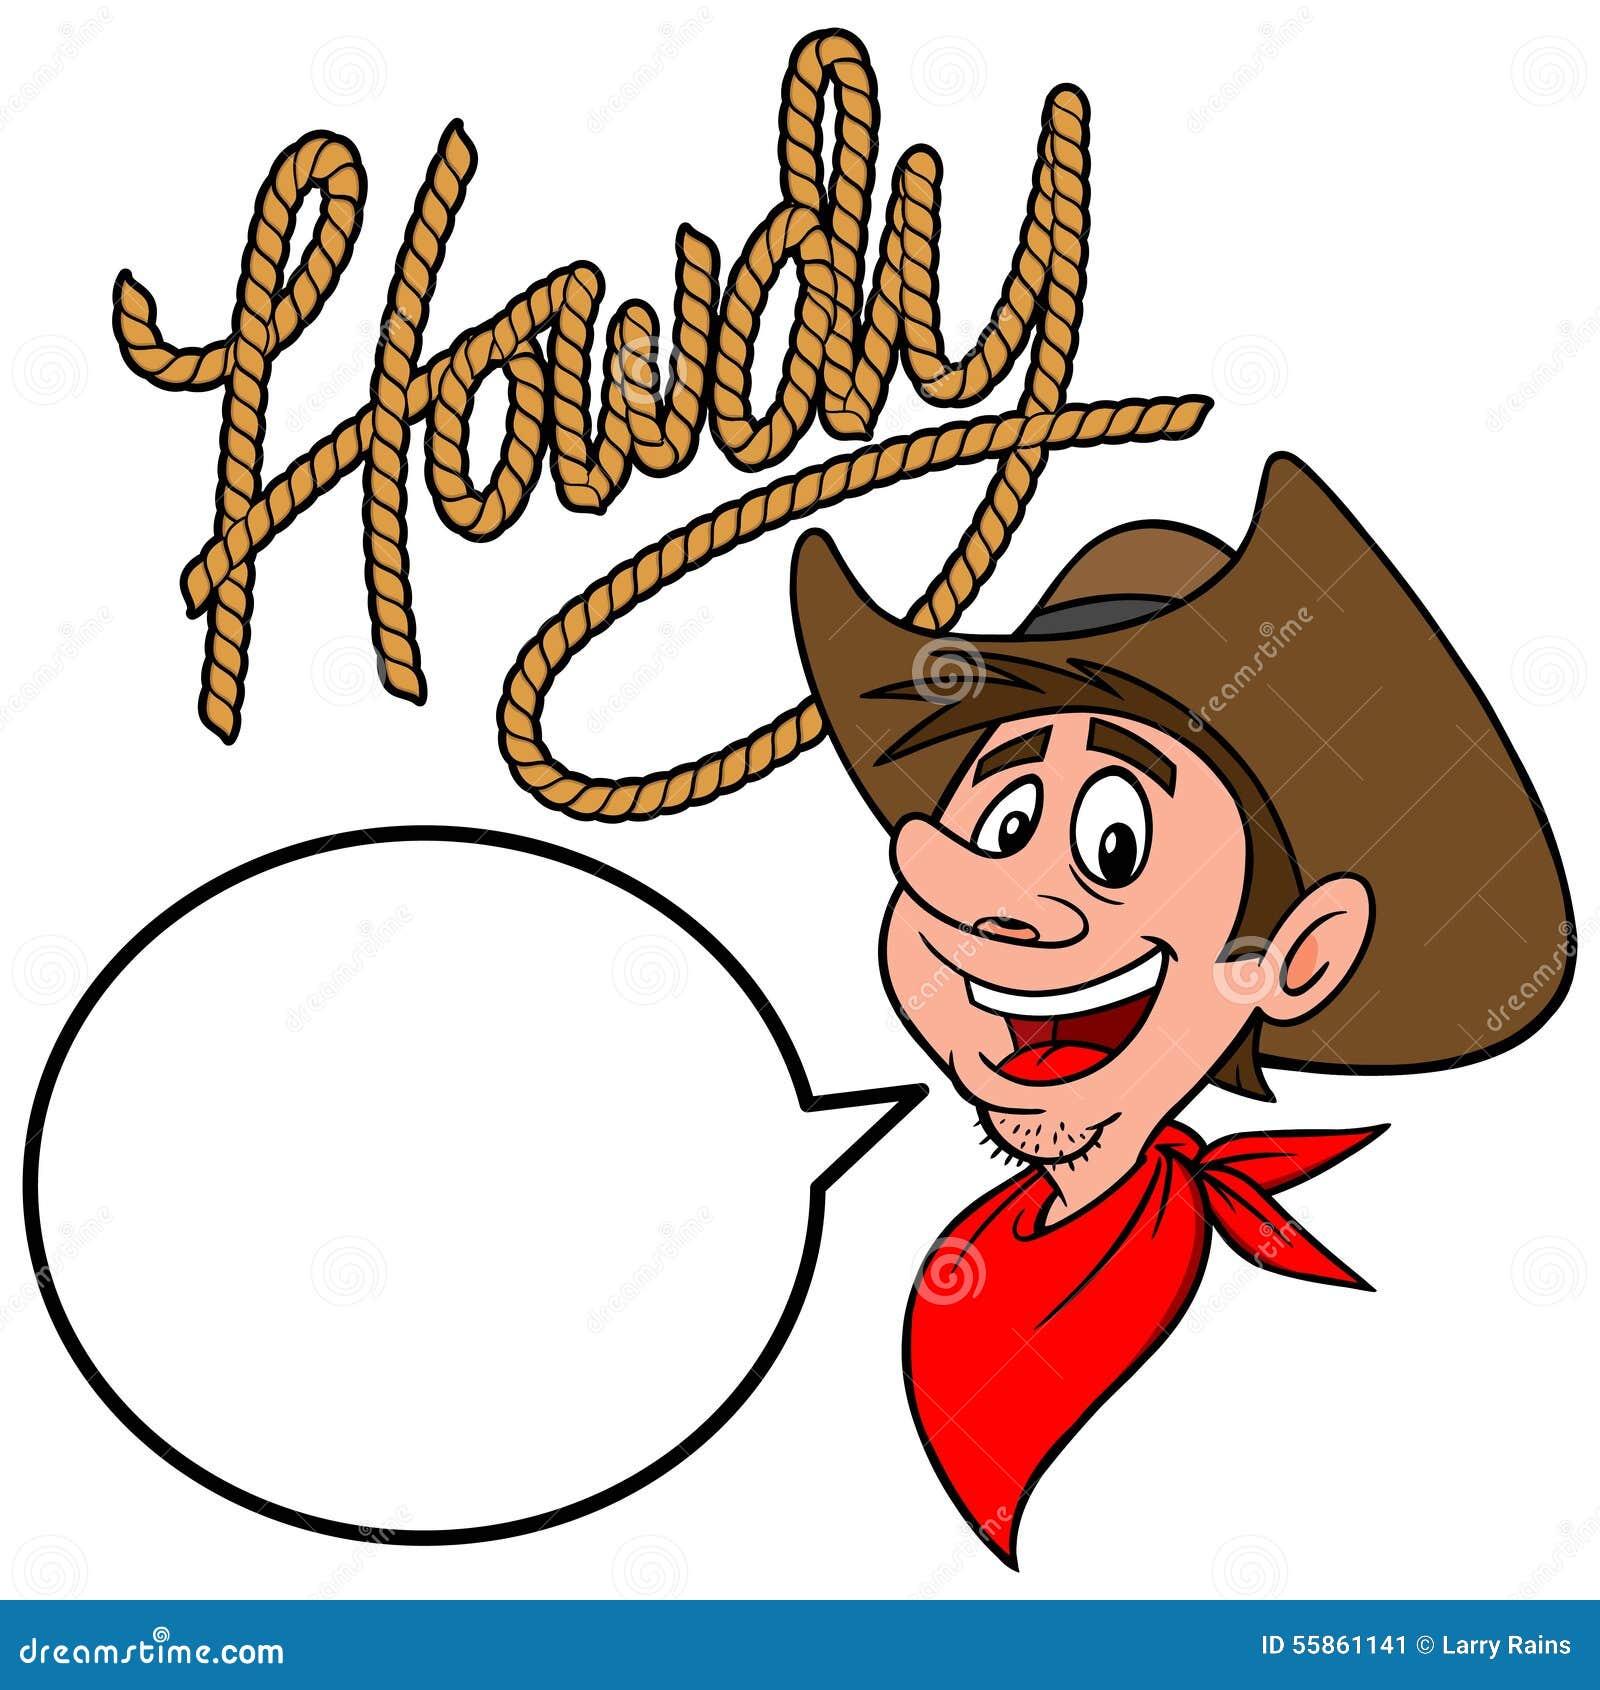 Howdy Cowboy Stock Vector - Image: 55861141